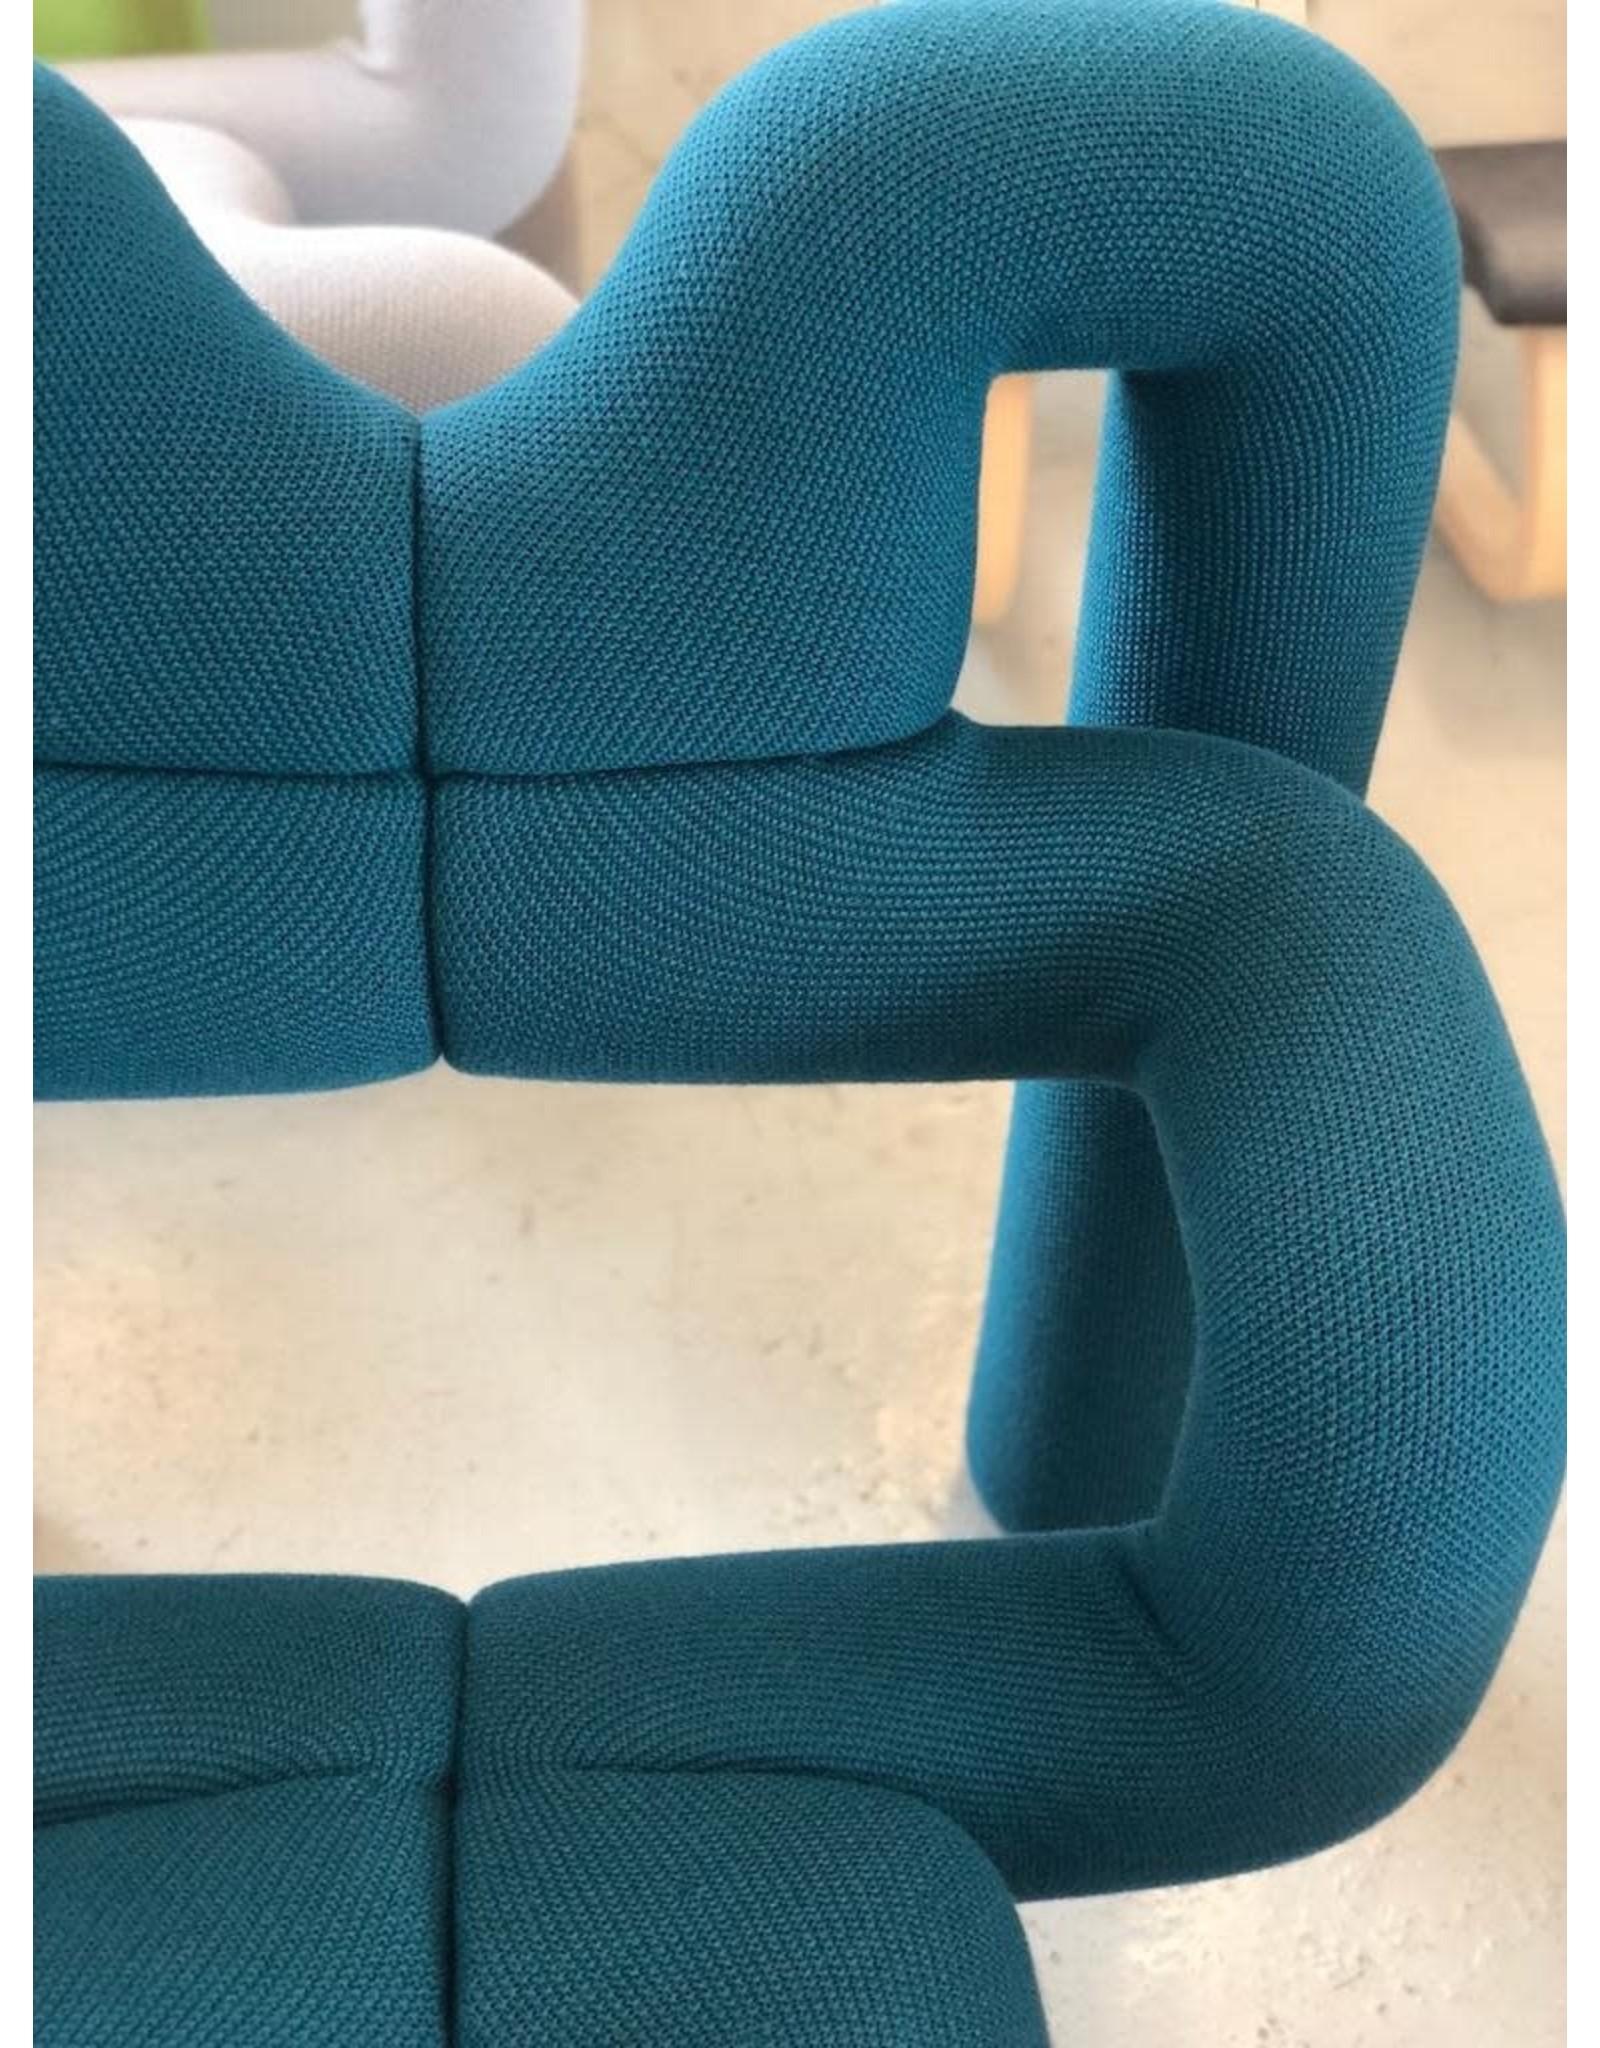 EKSTREM 创新休闲椅